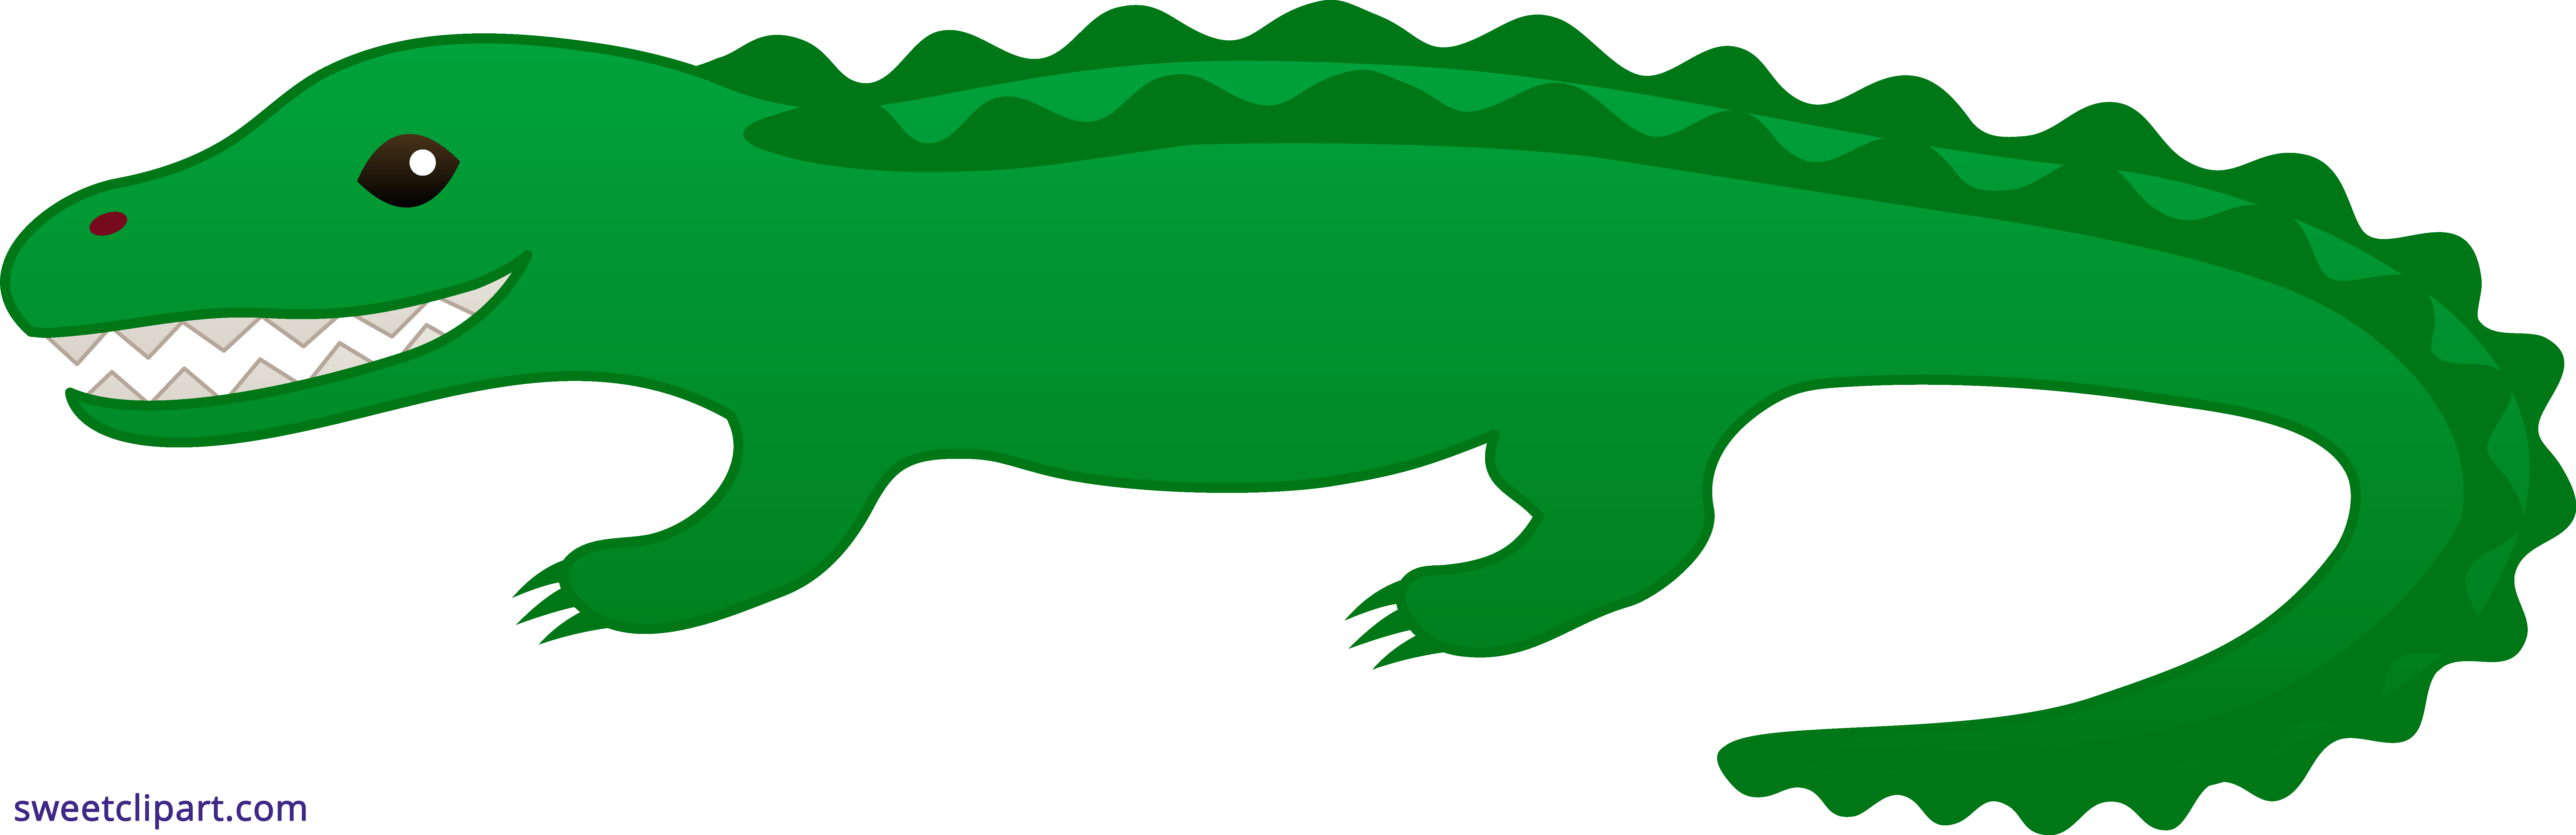 Sweet clip art. Girls clipart alligator